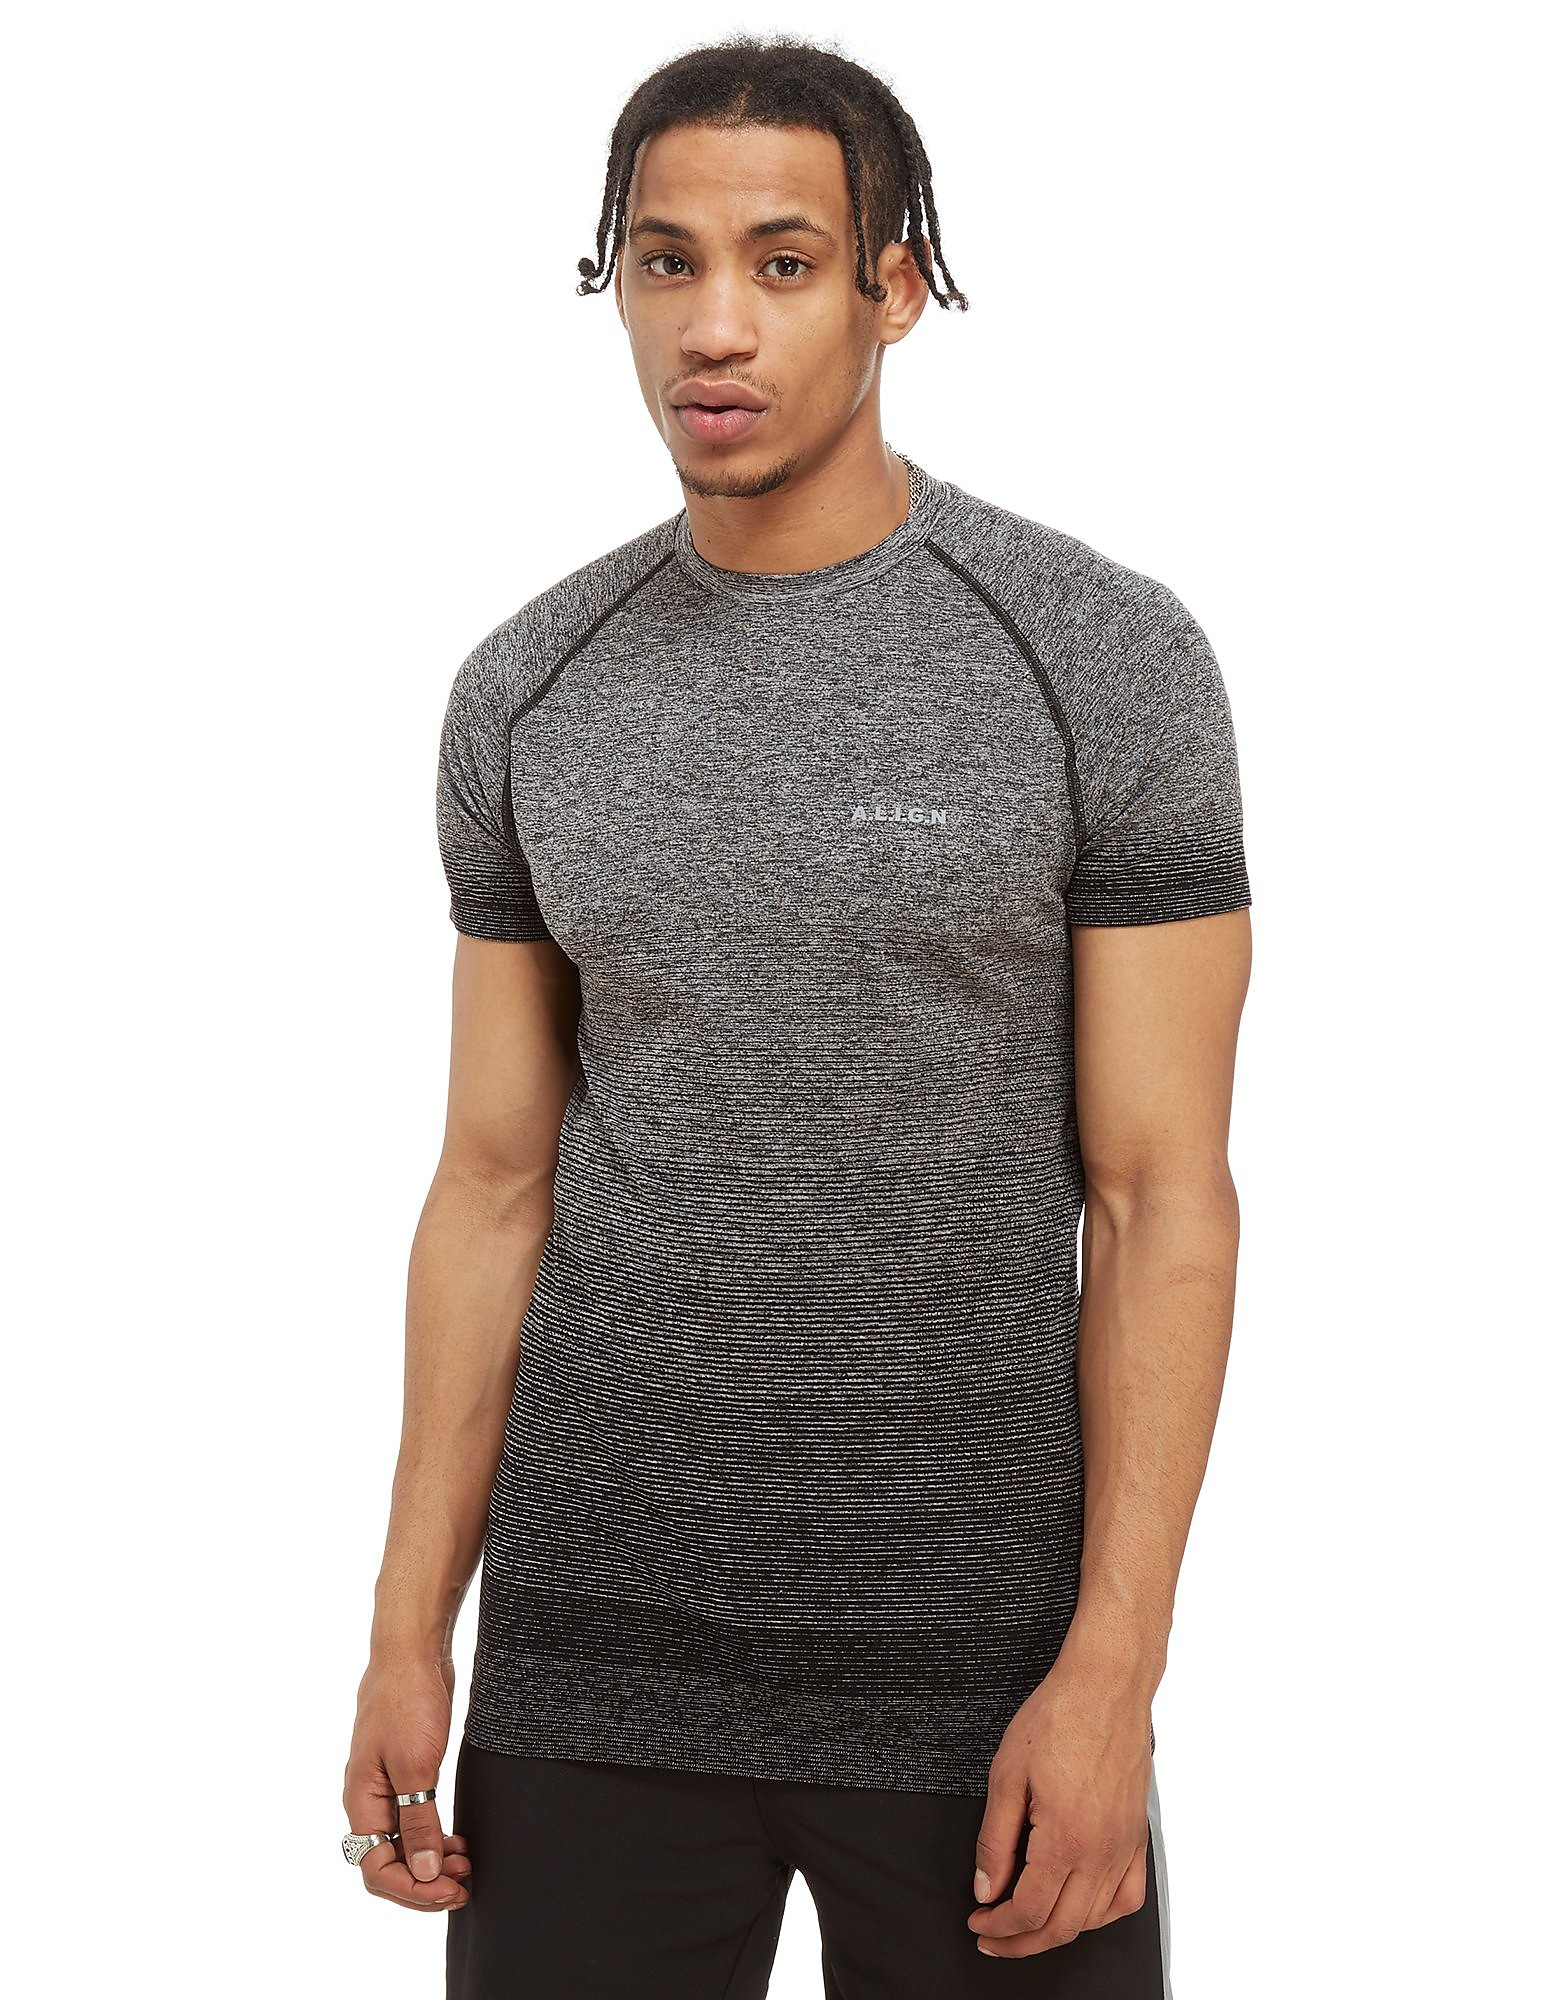 Align Fleetwing T-Shirt